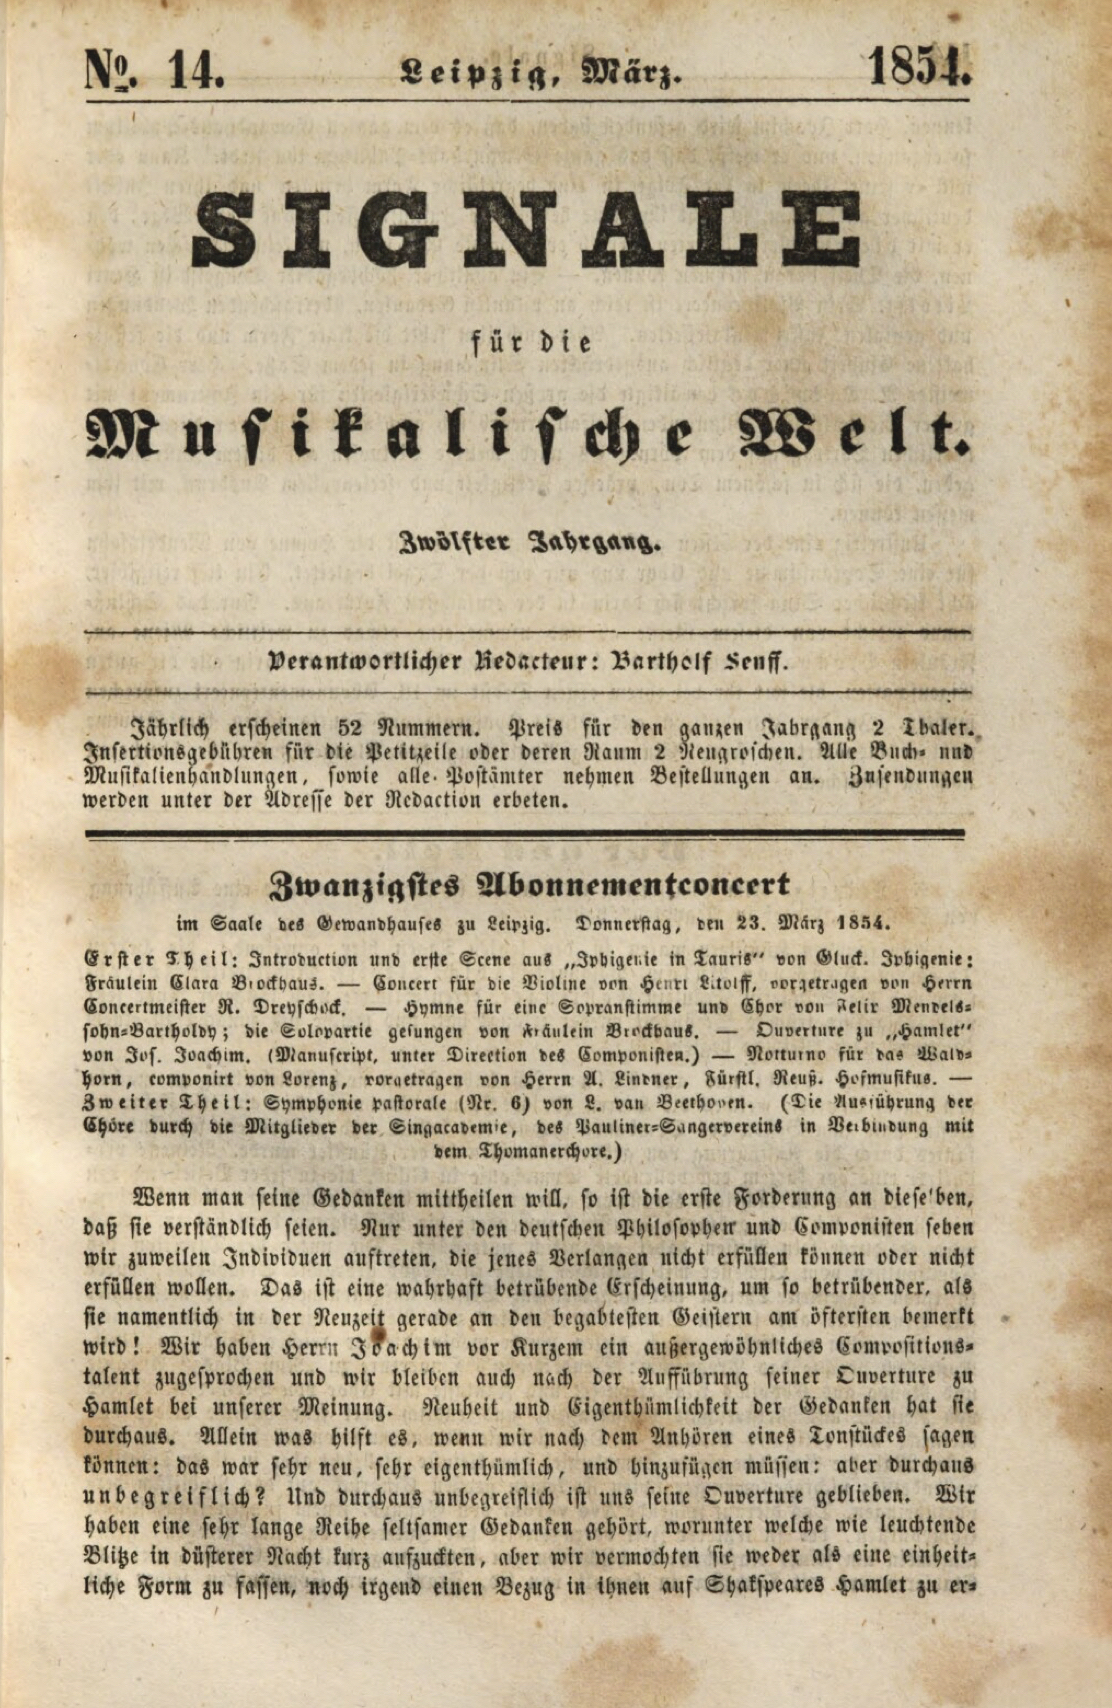 3-hamlet-review-signale-23-march-1854-gewandhaus-copy-2-1